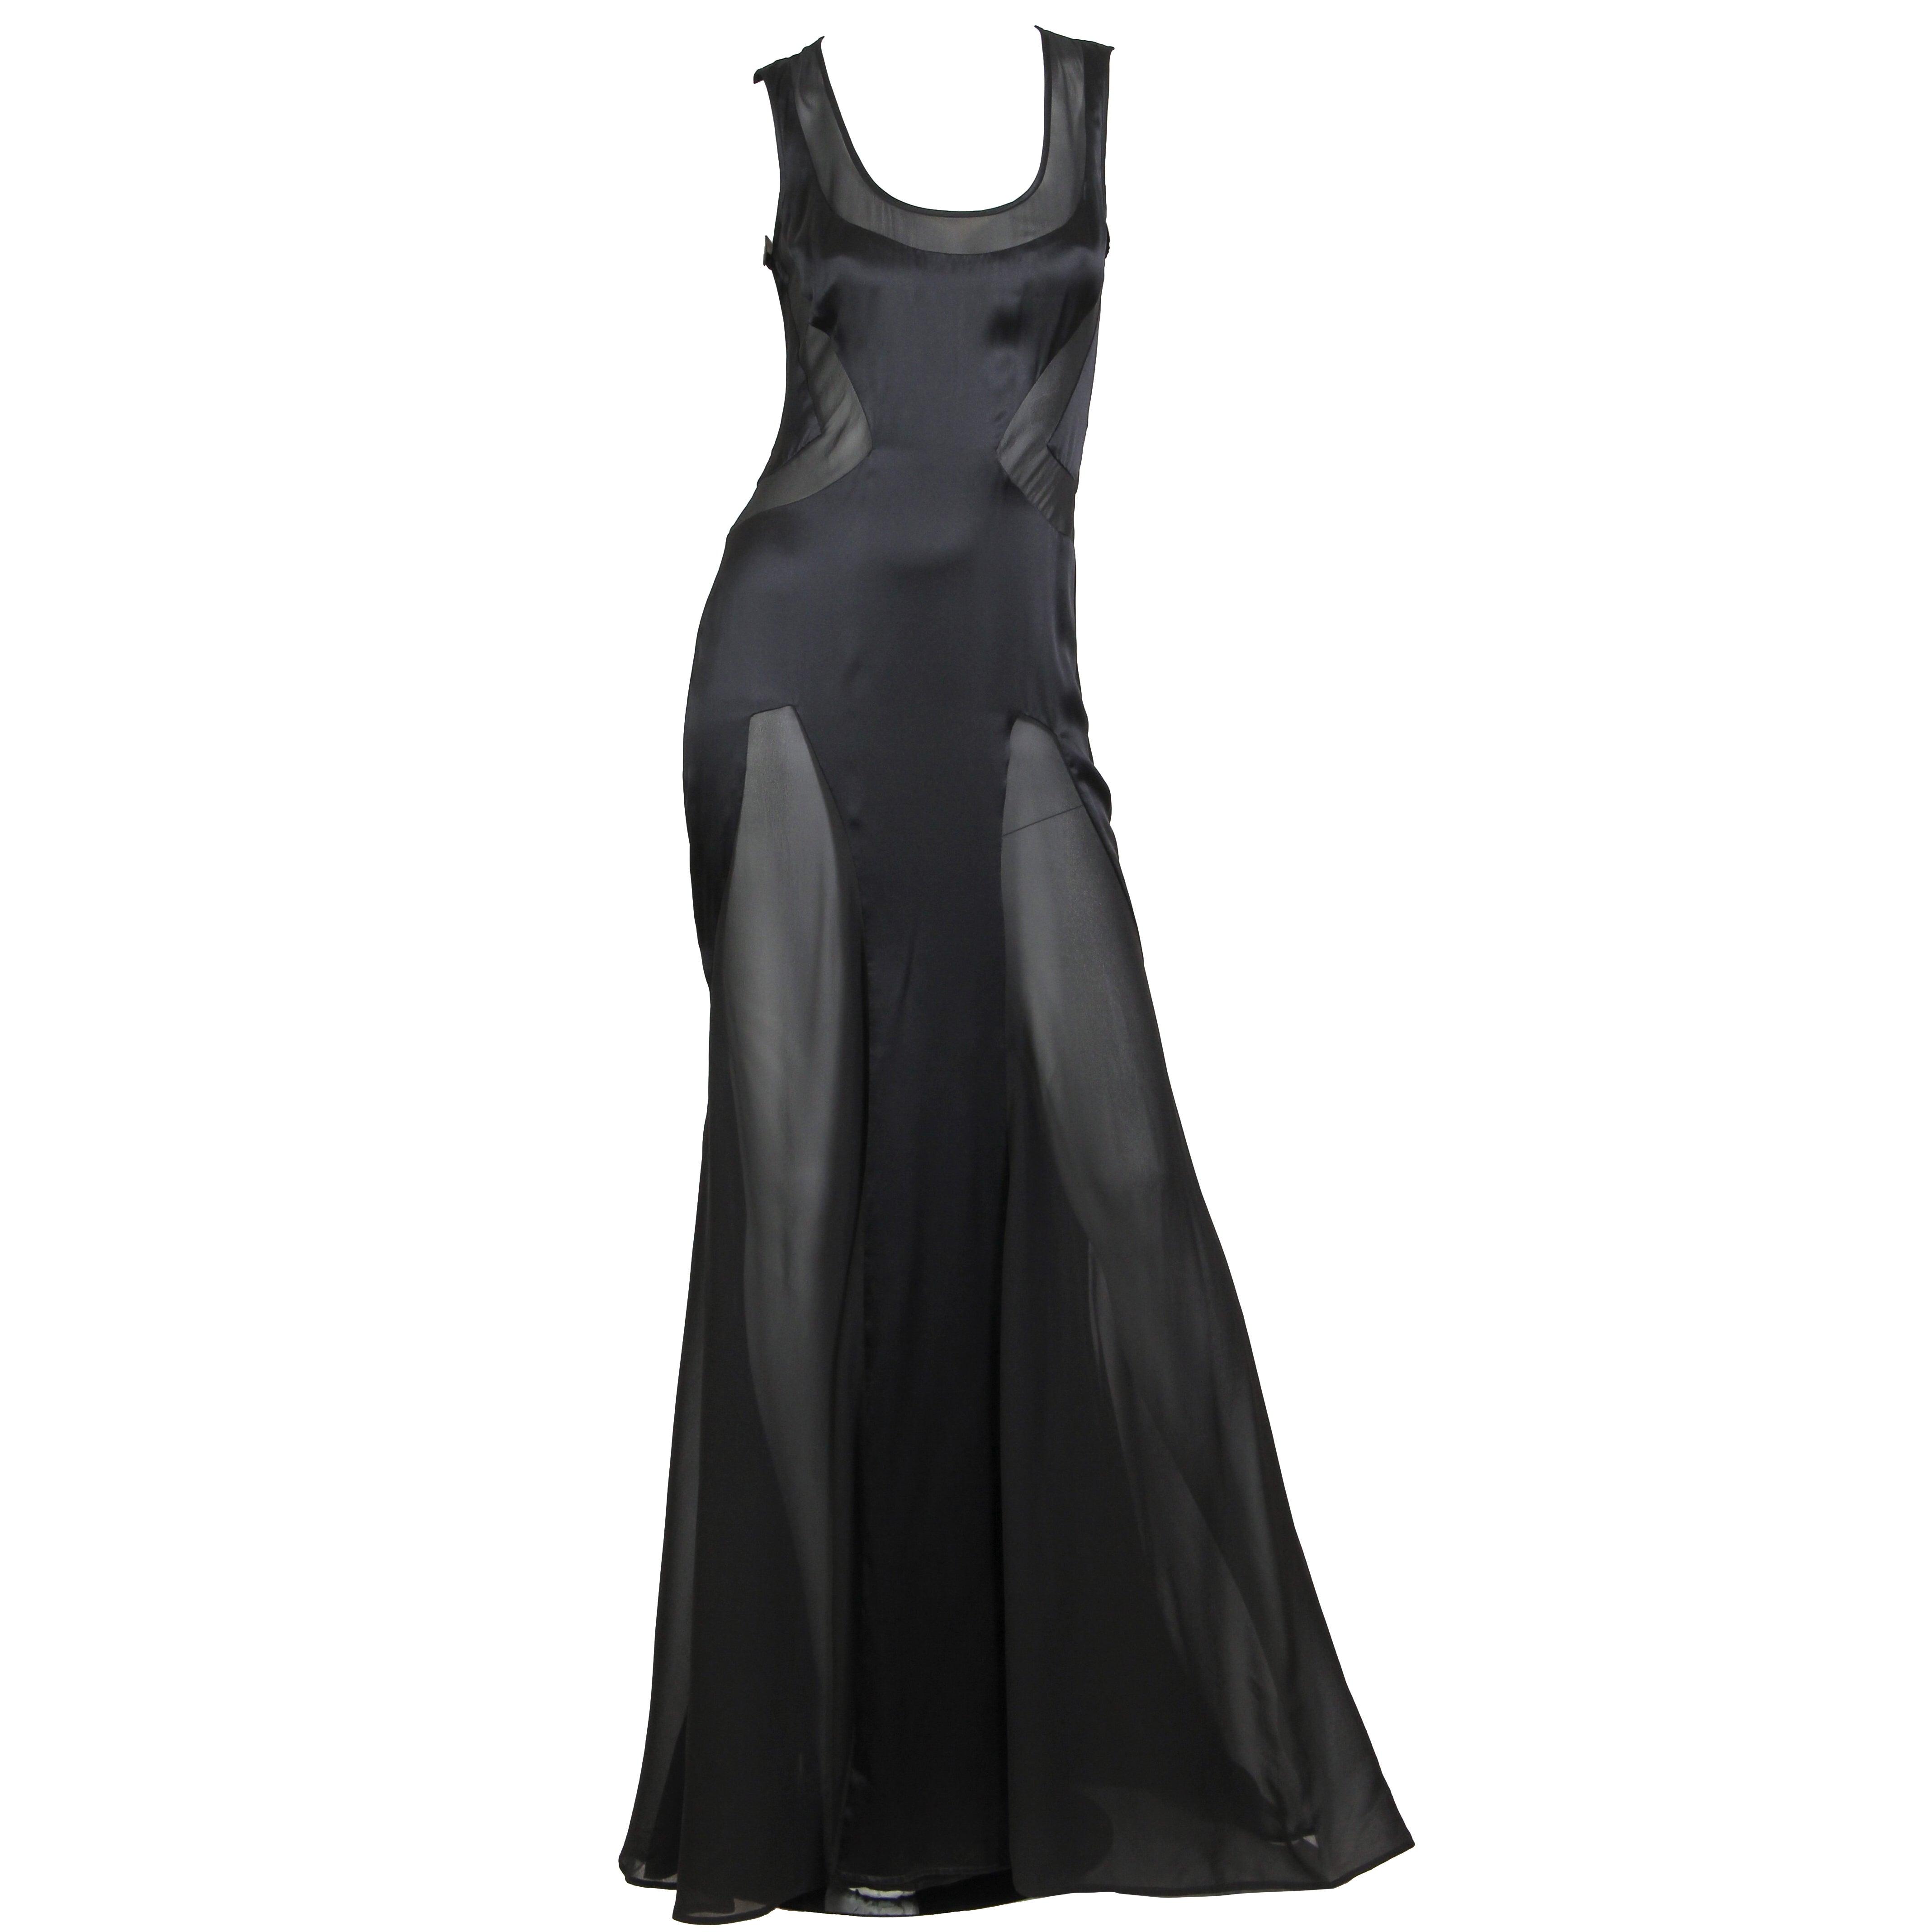 2000S VERSACE Black Silk Charmeuse Gown With Sheer Chiffon Peek-A-Boo Panels